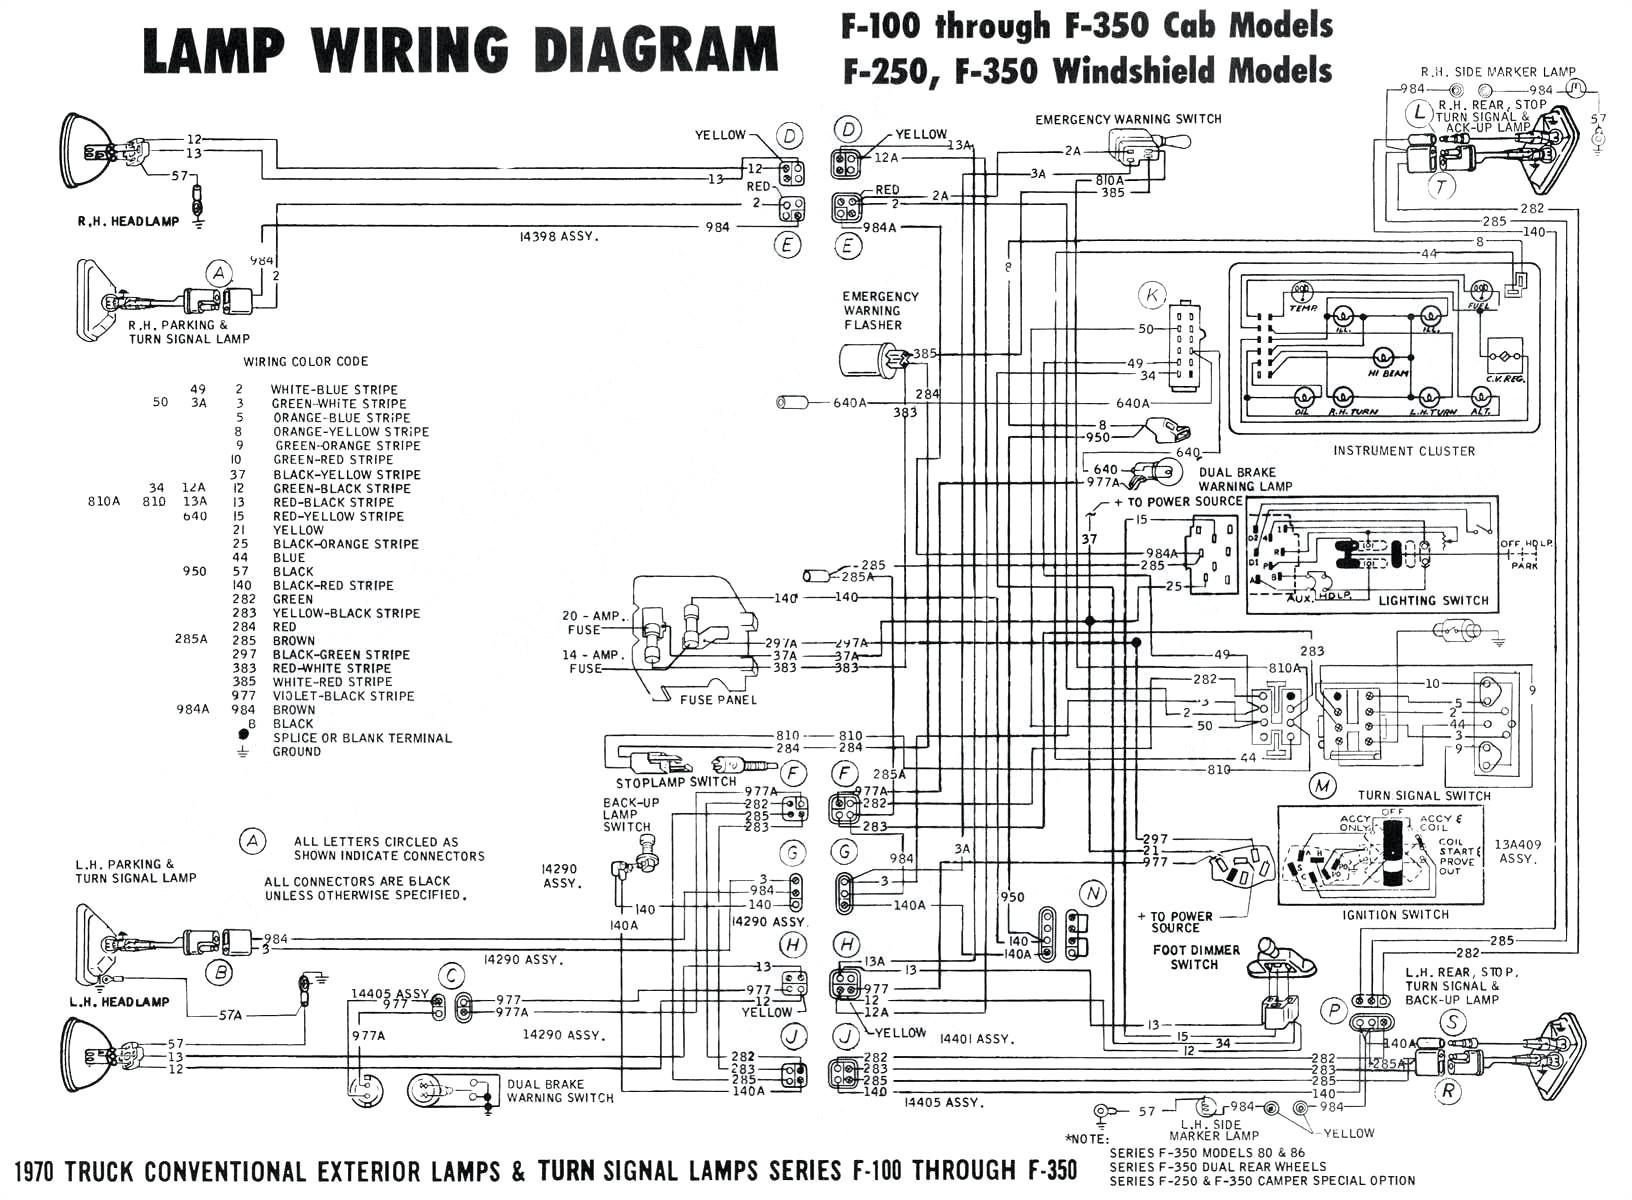 1951 ford wiring wiring diagram basic multiquip generator 4hk1x wiring schematic